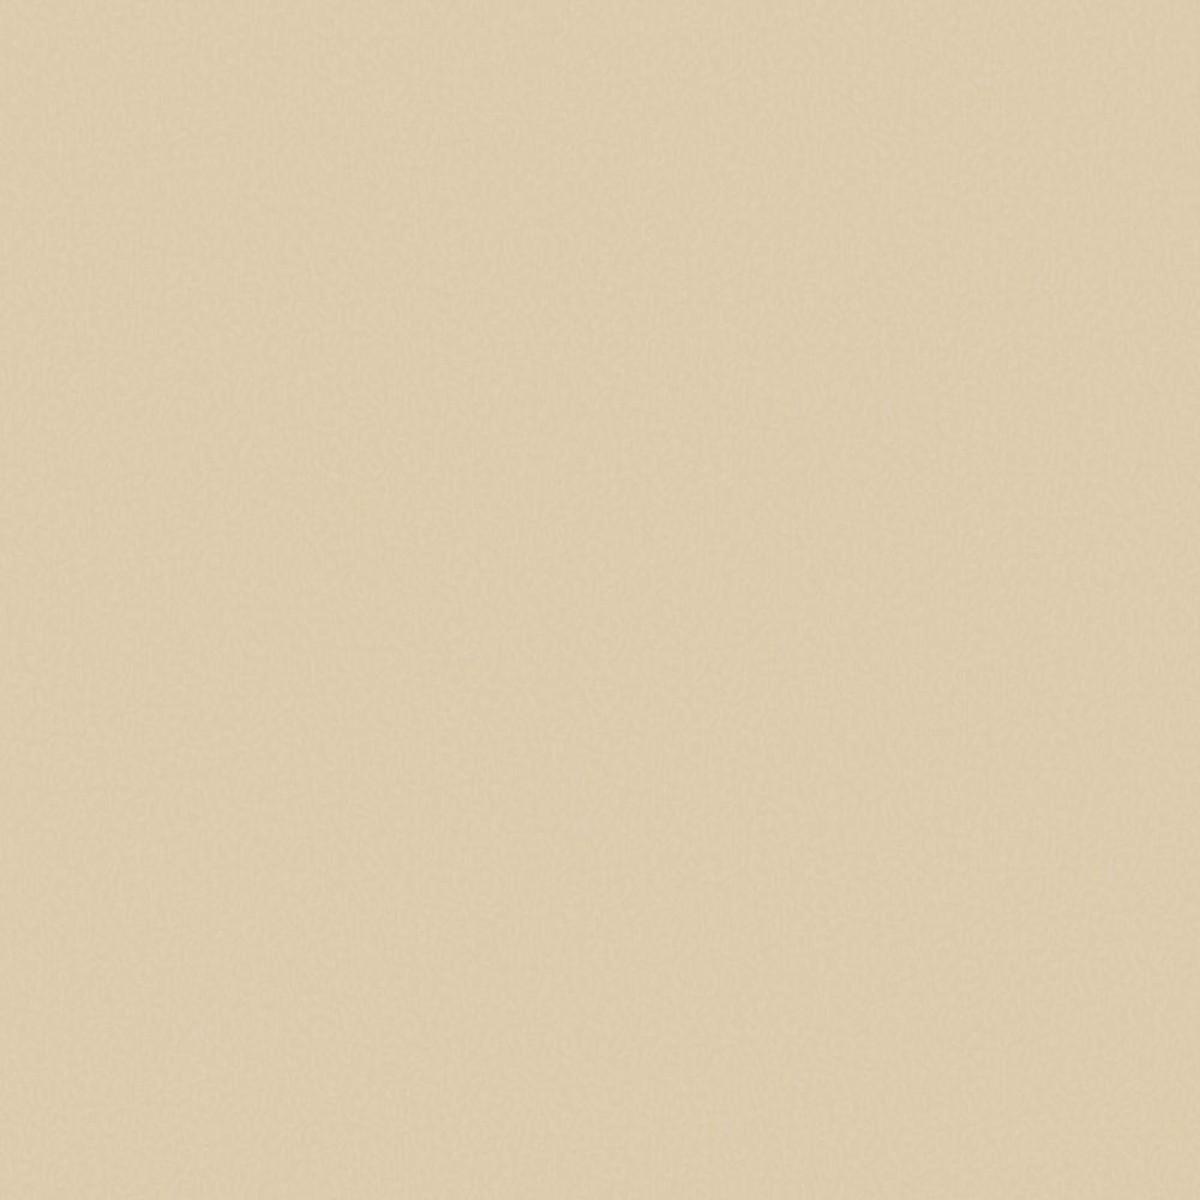 Обои виниловые Aura Texture World бежевые 0.53 м H2990503